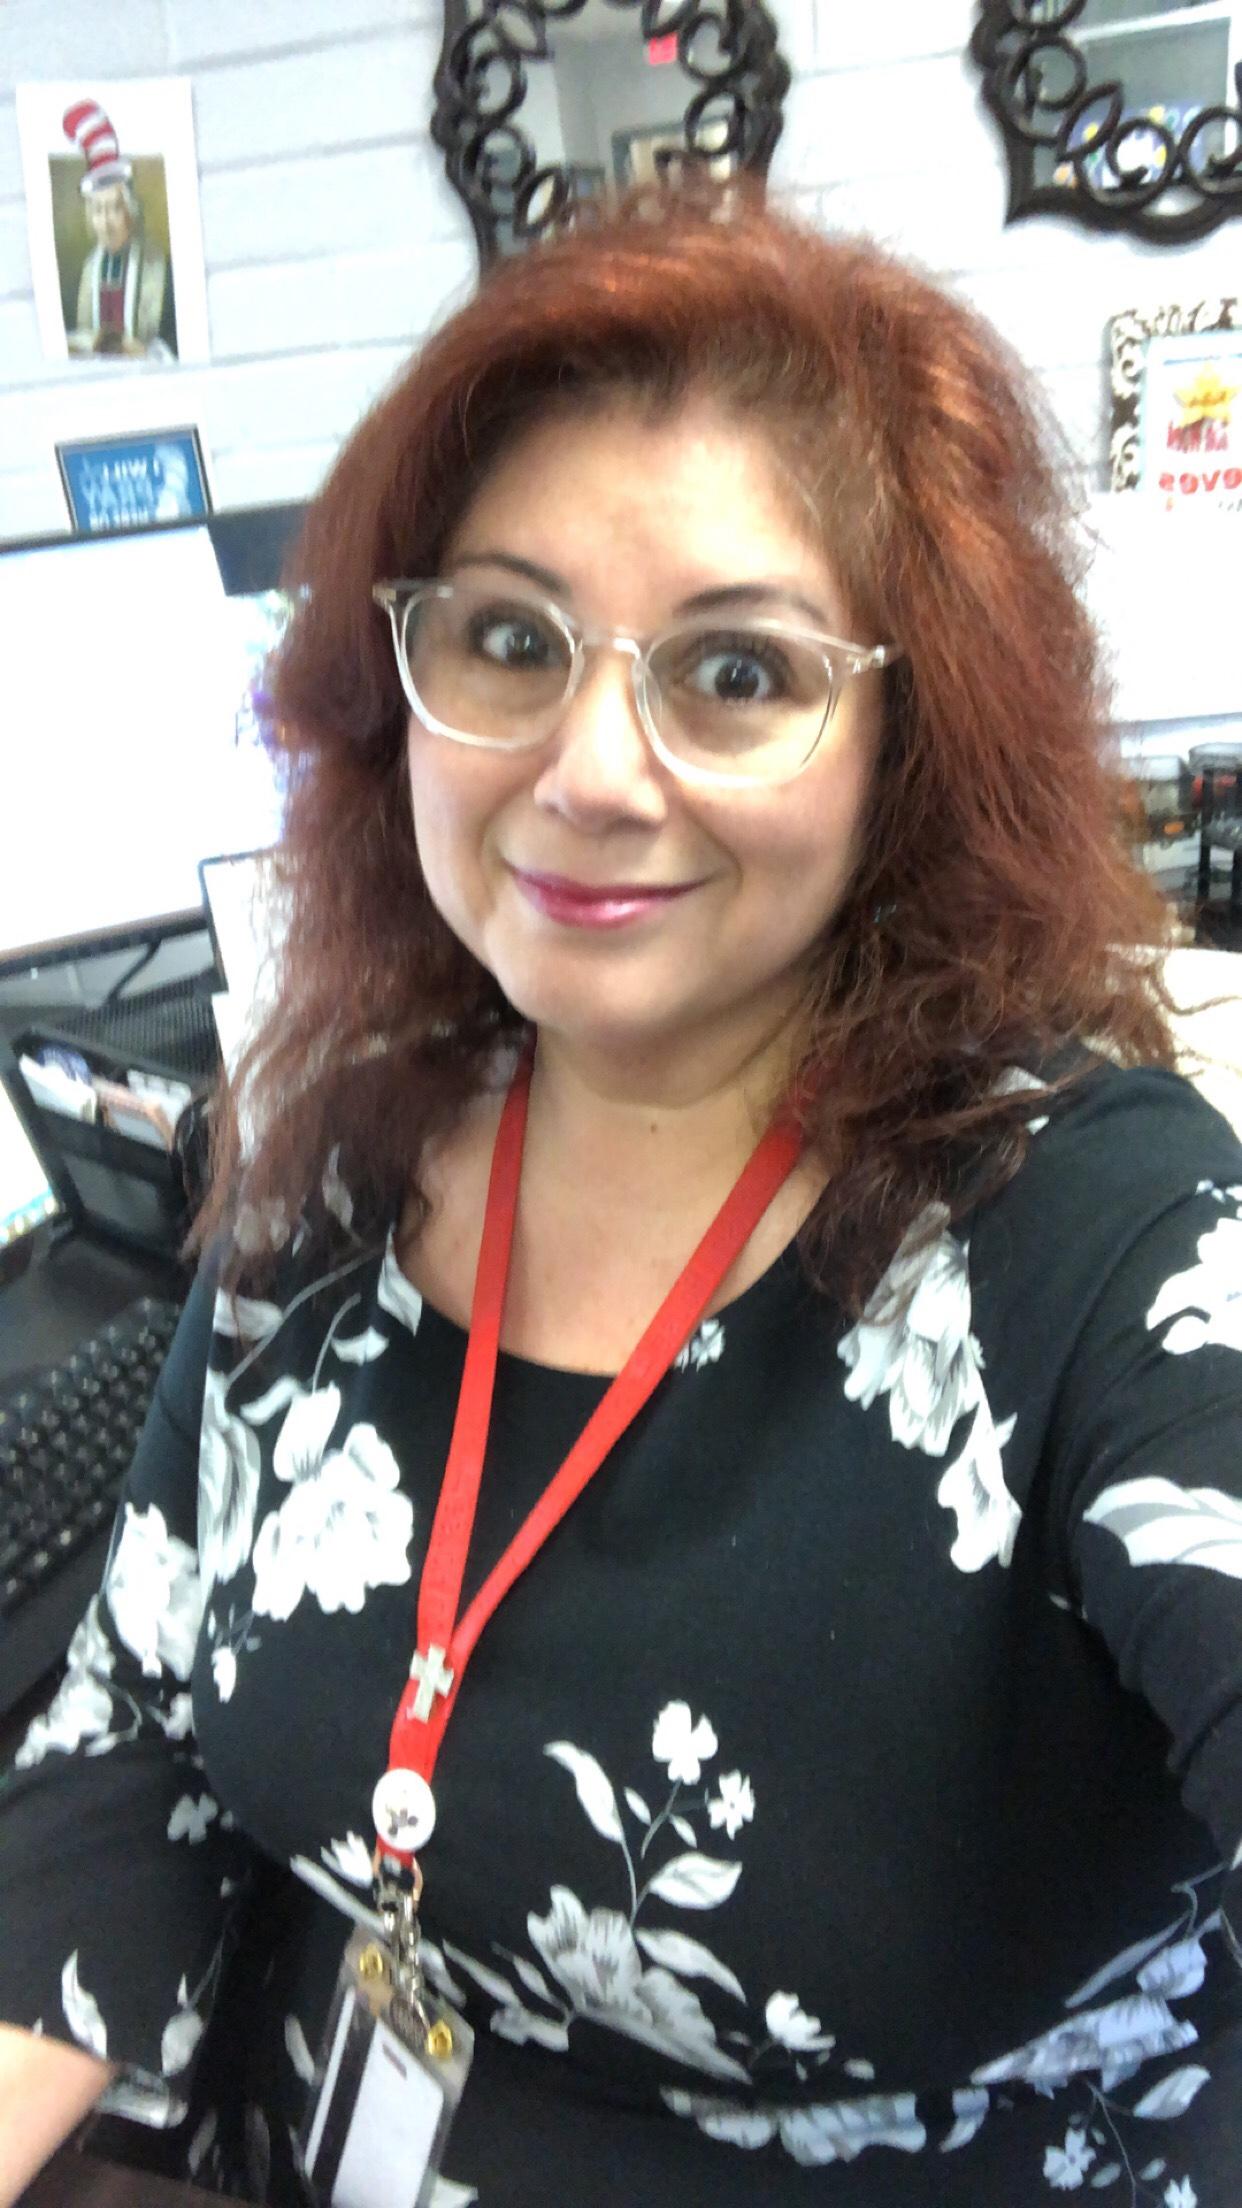 Melissa Reyes, 2019 #SimpleJoys http://MizMeliz.wordpress.com